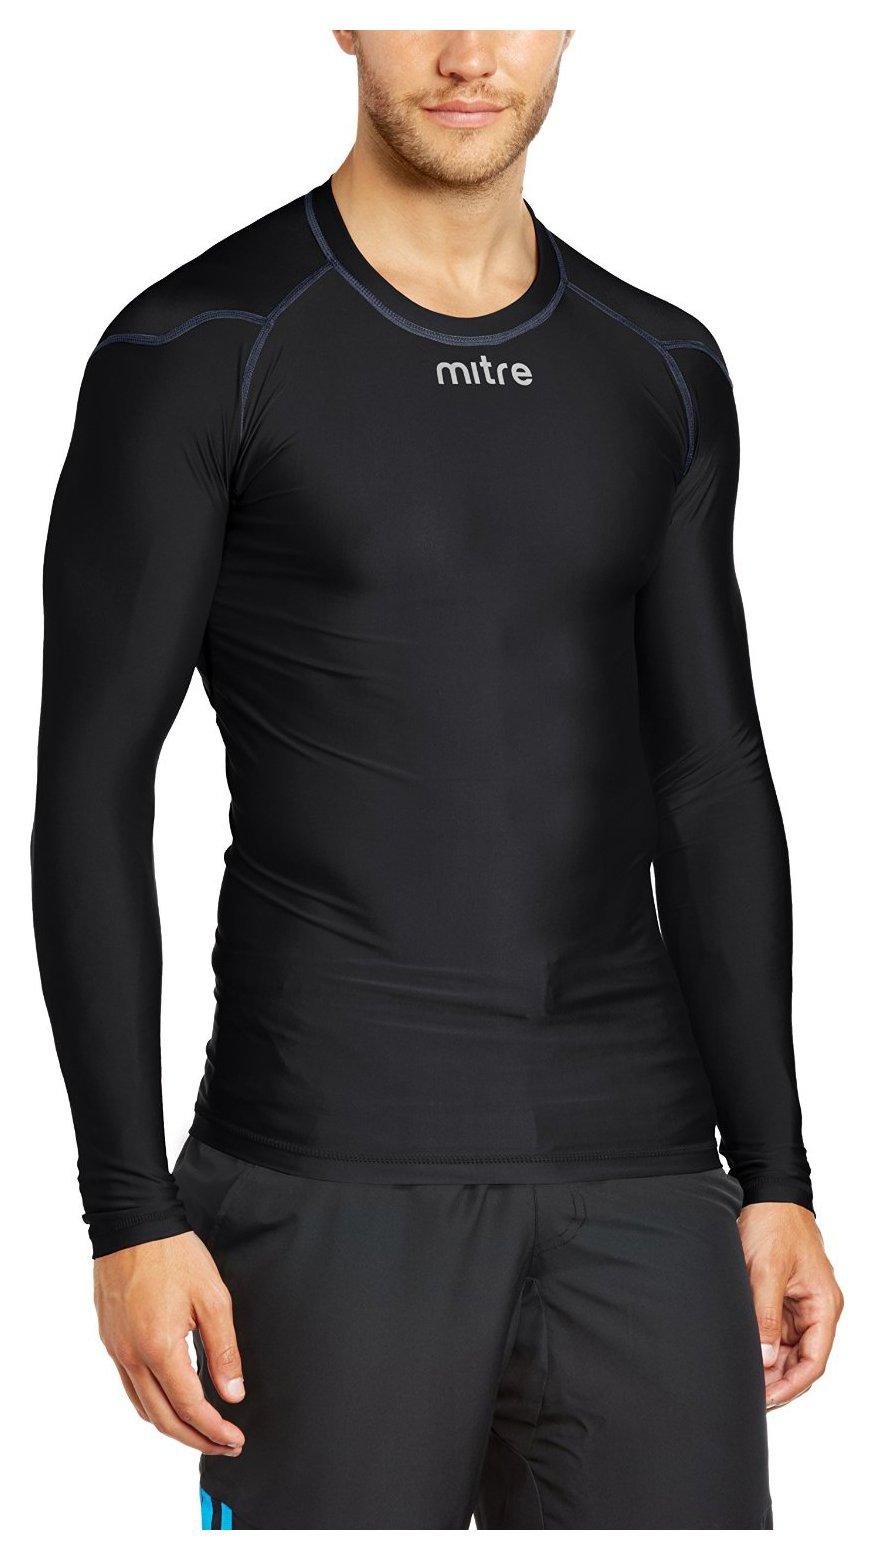 Image of Mitre - Base Layer Jersey Black - XL